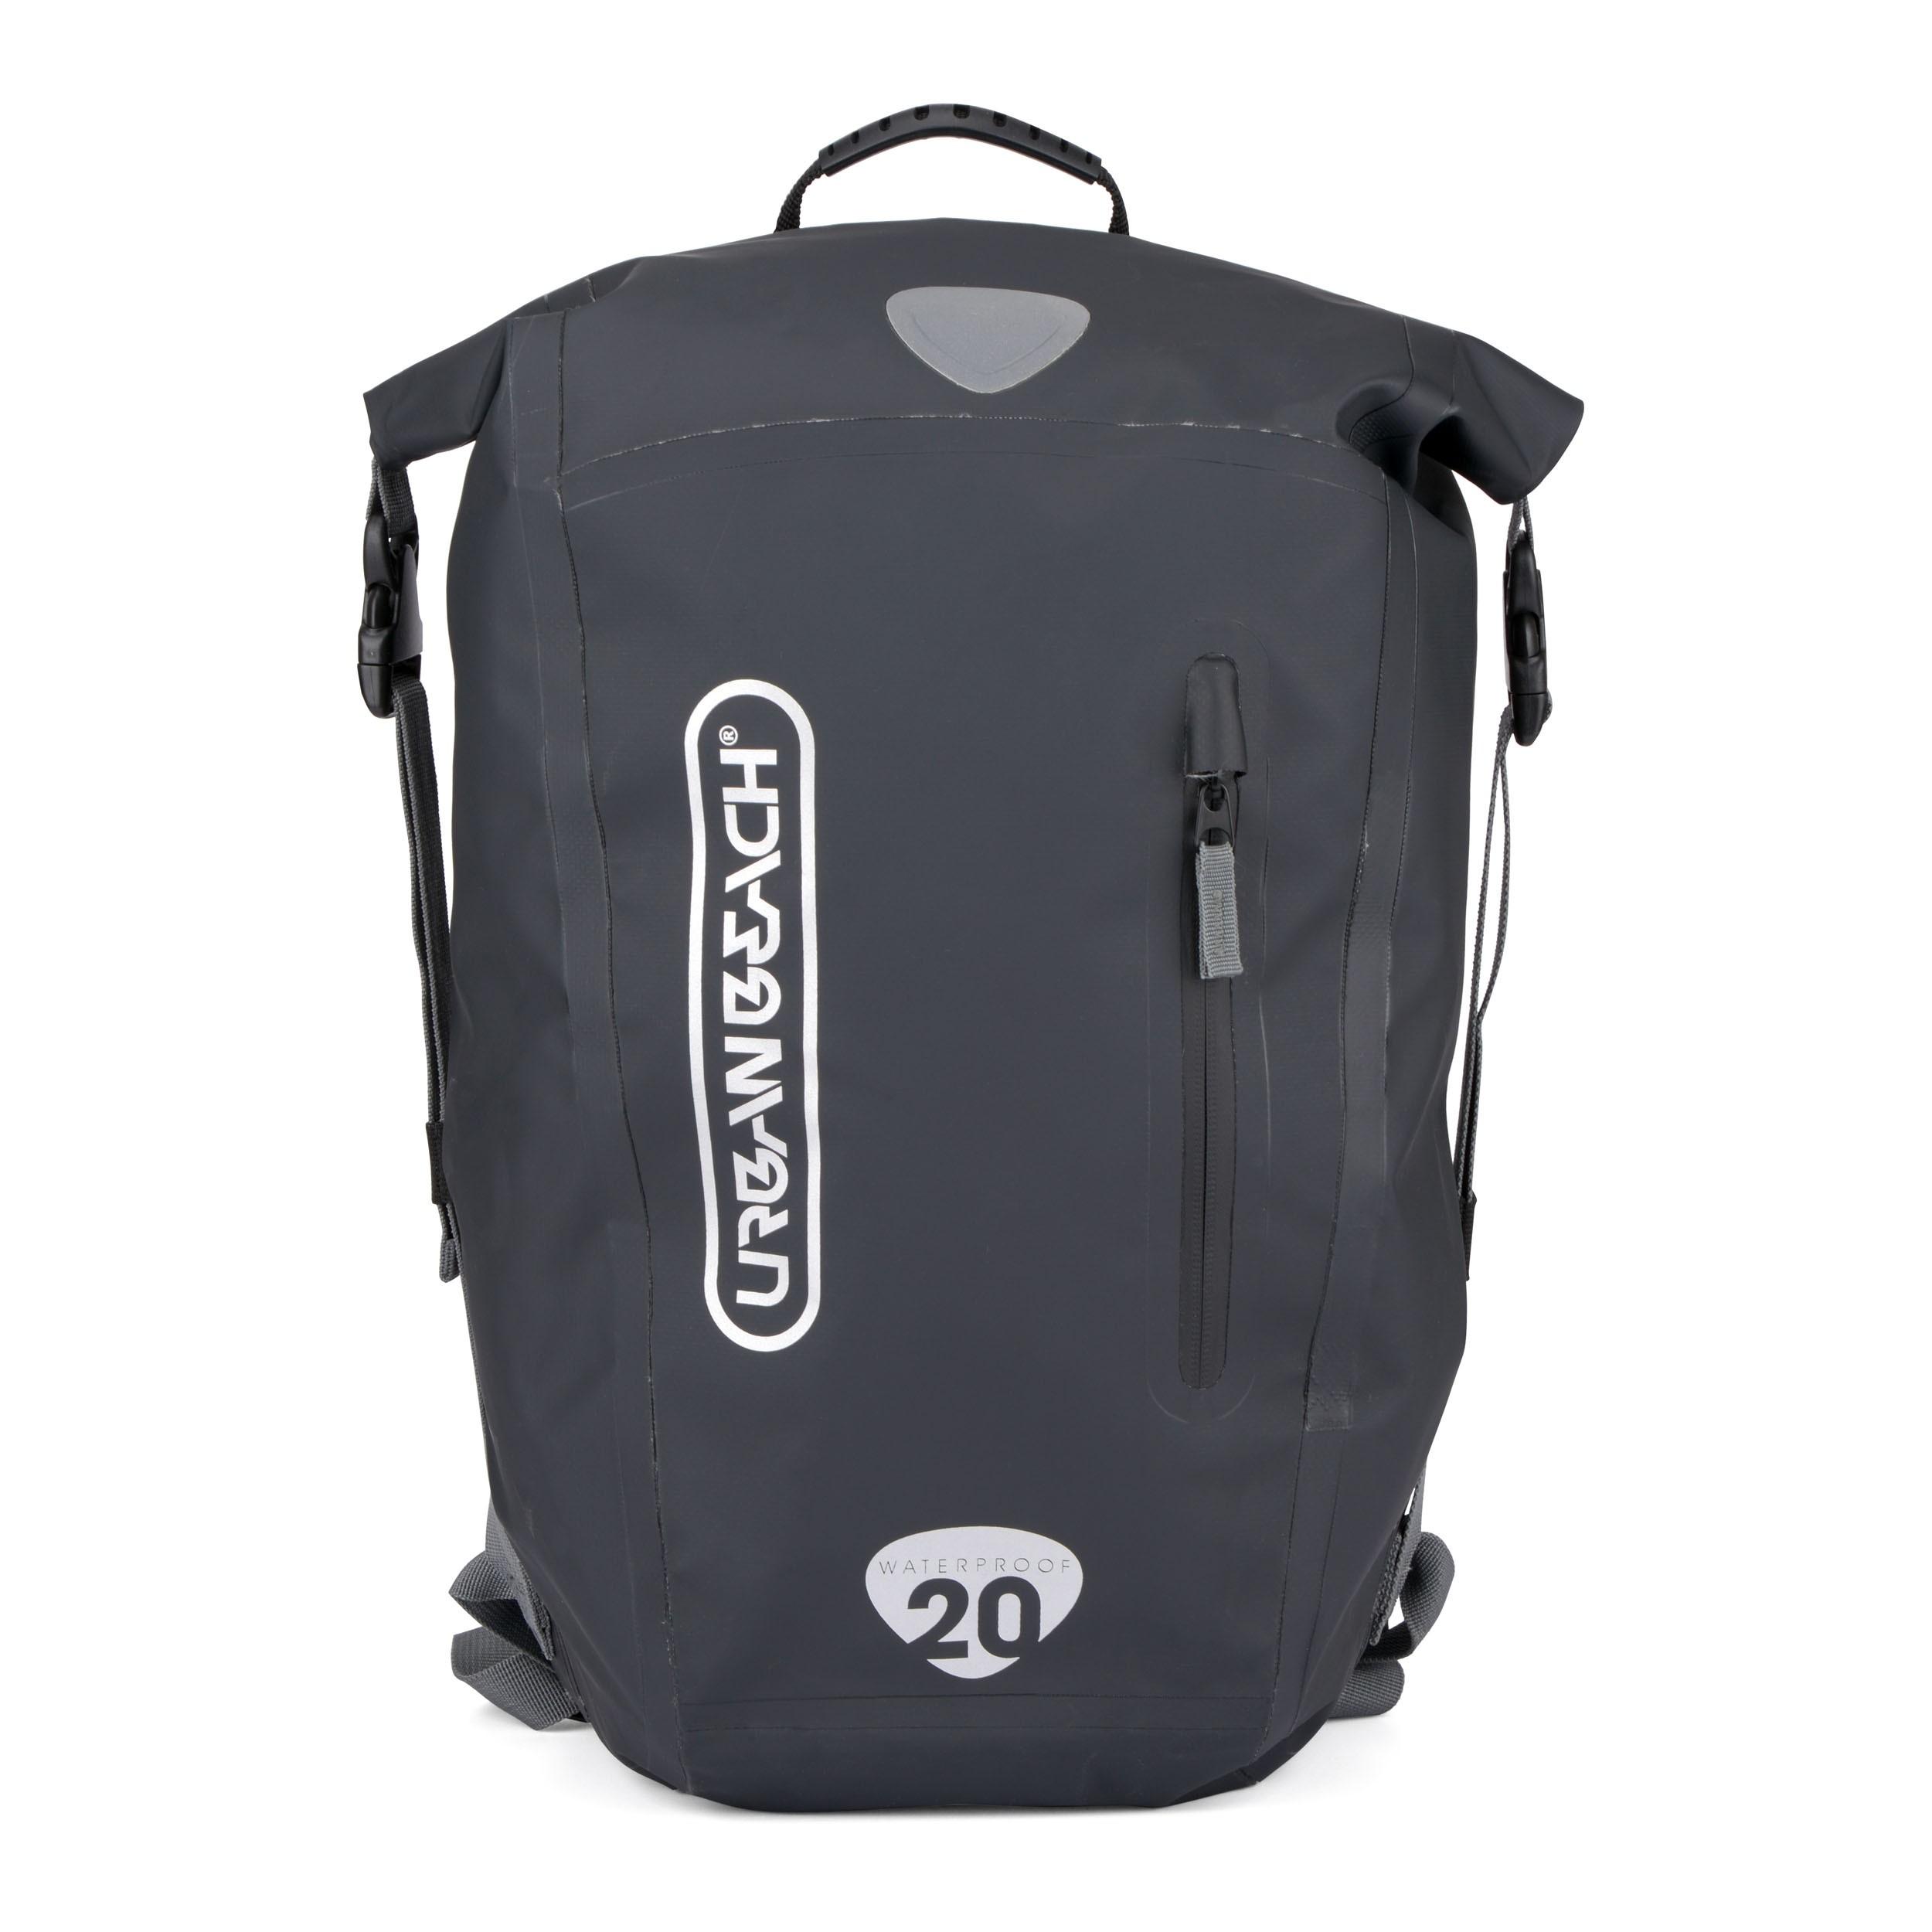 20L Dry Bag - Black